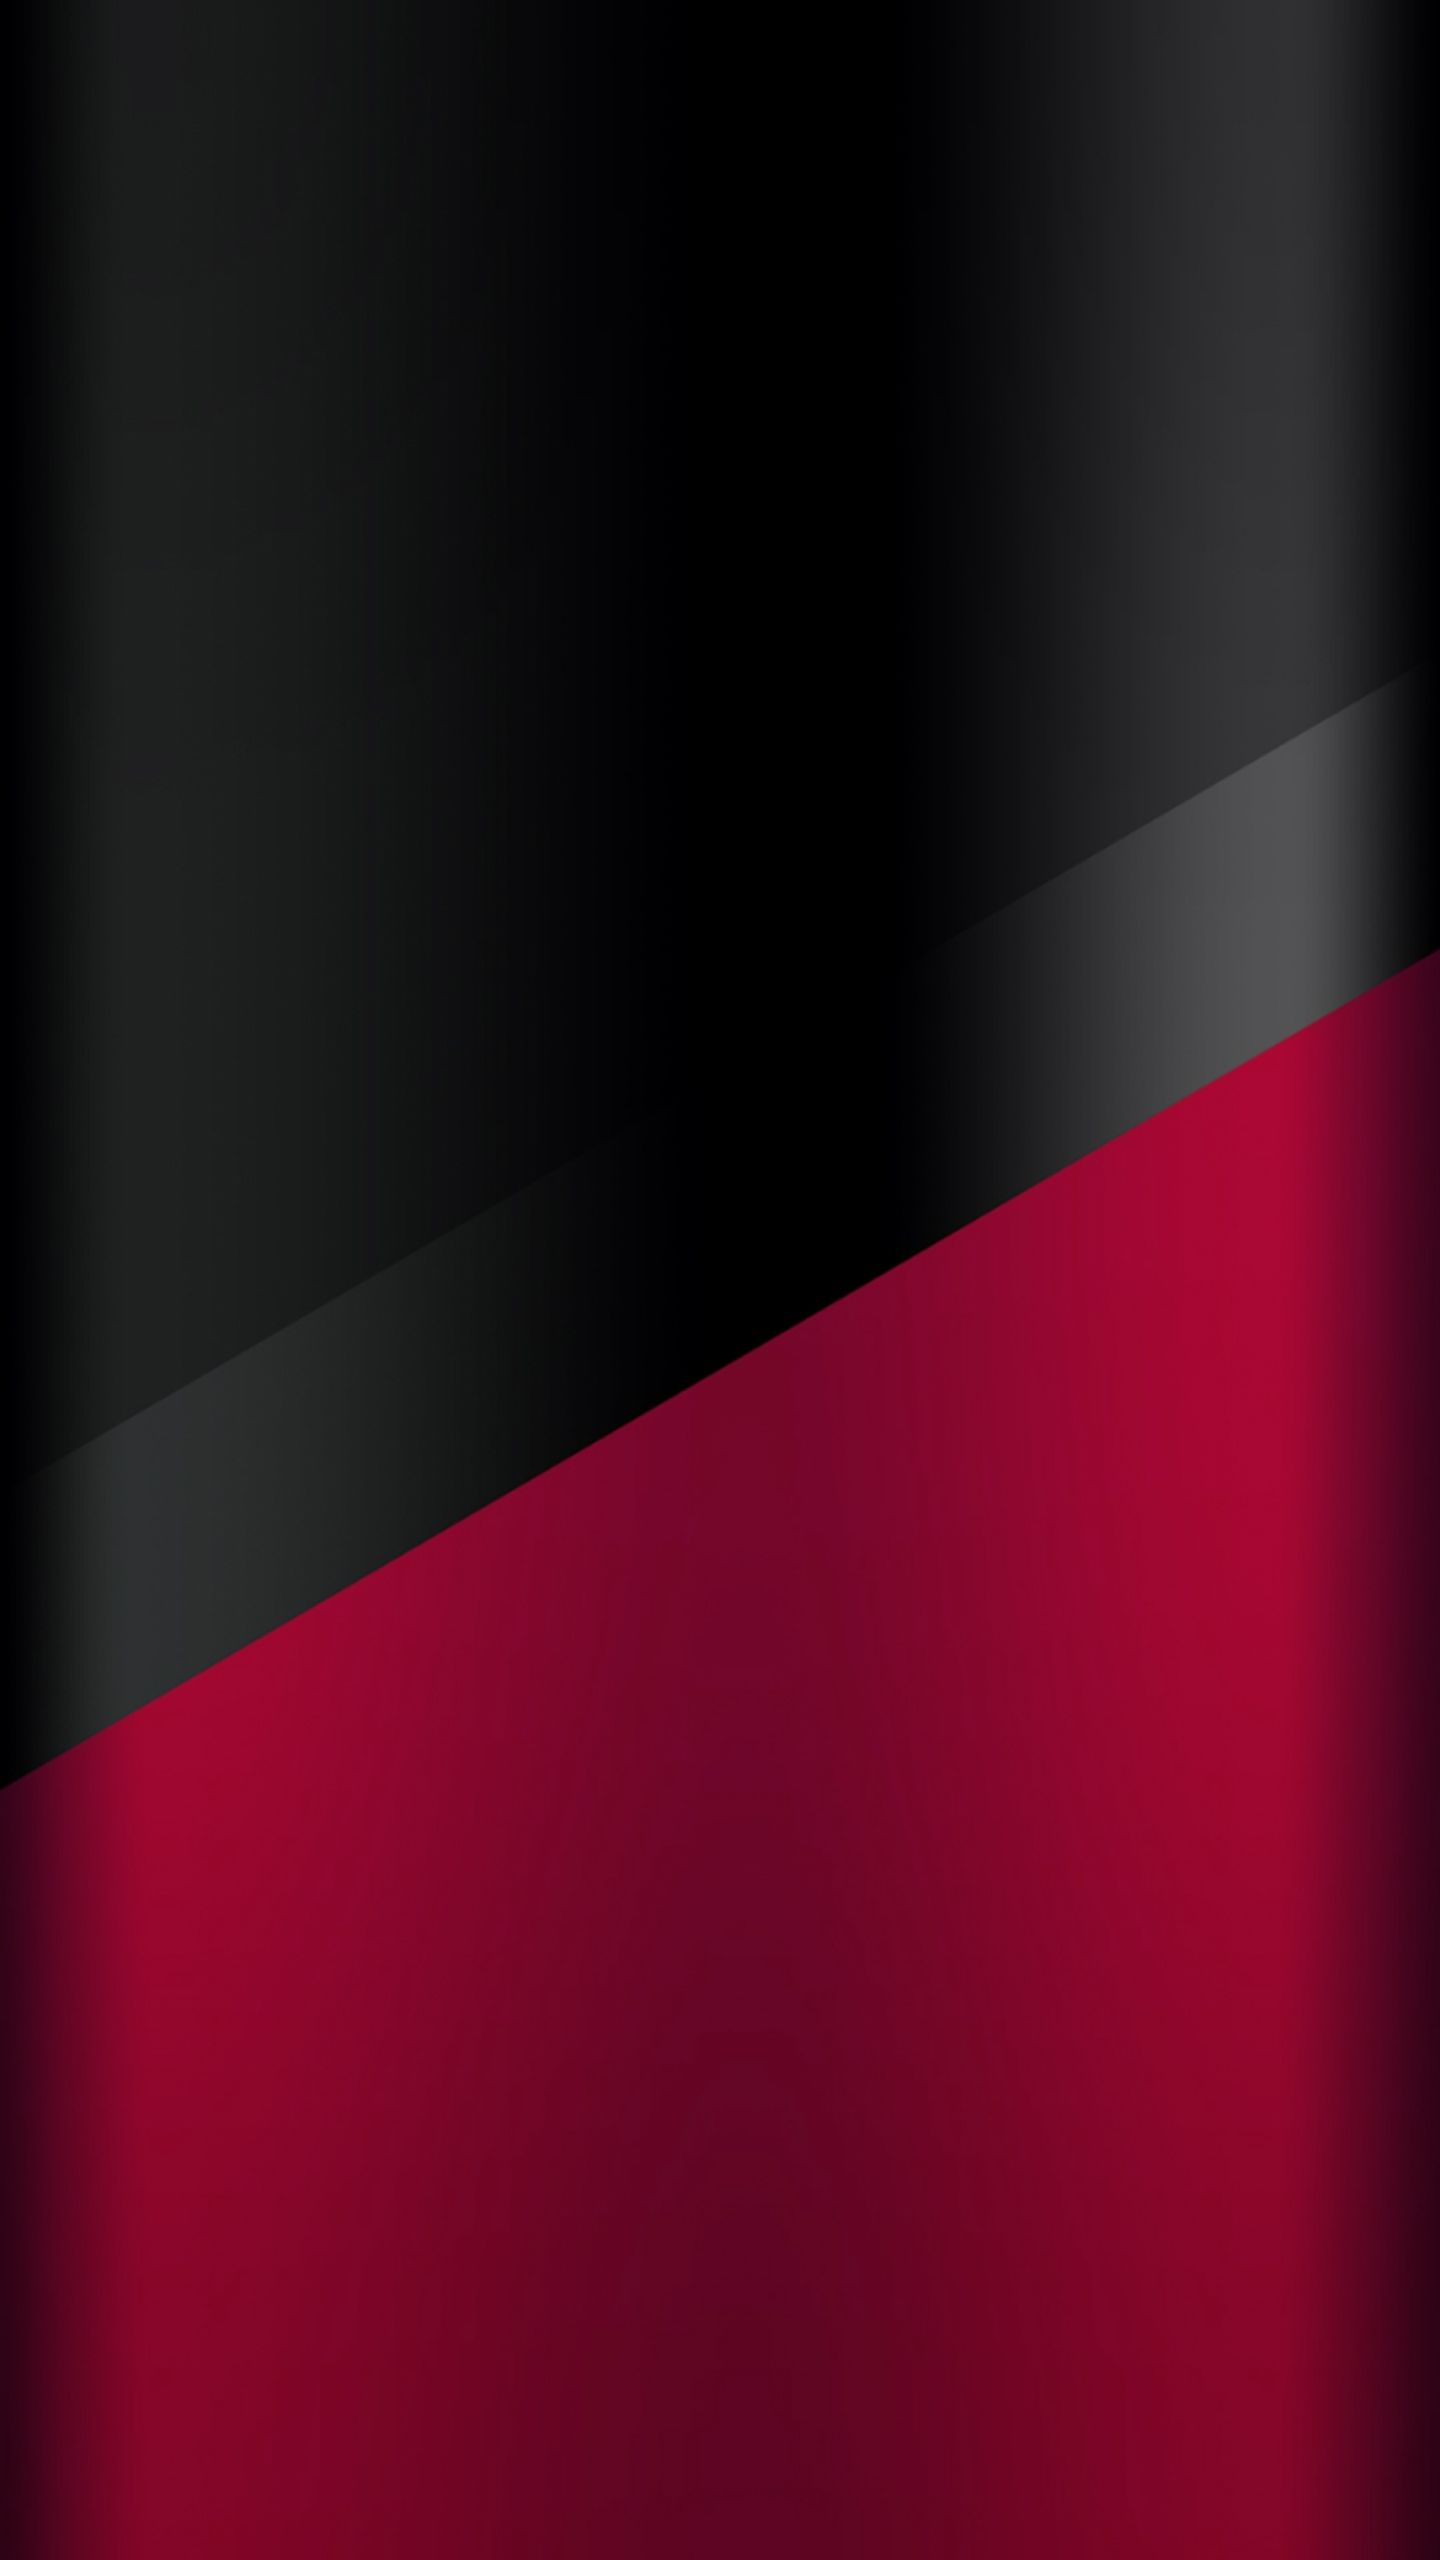 Dark S7 Edge Wallpaper 03   Black and Red Samsung galaxy 1440x2560